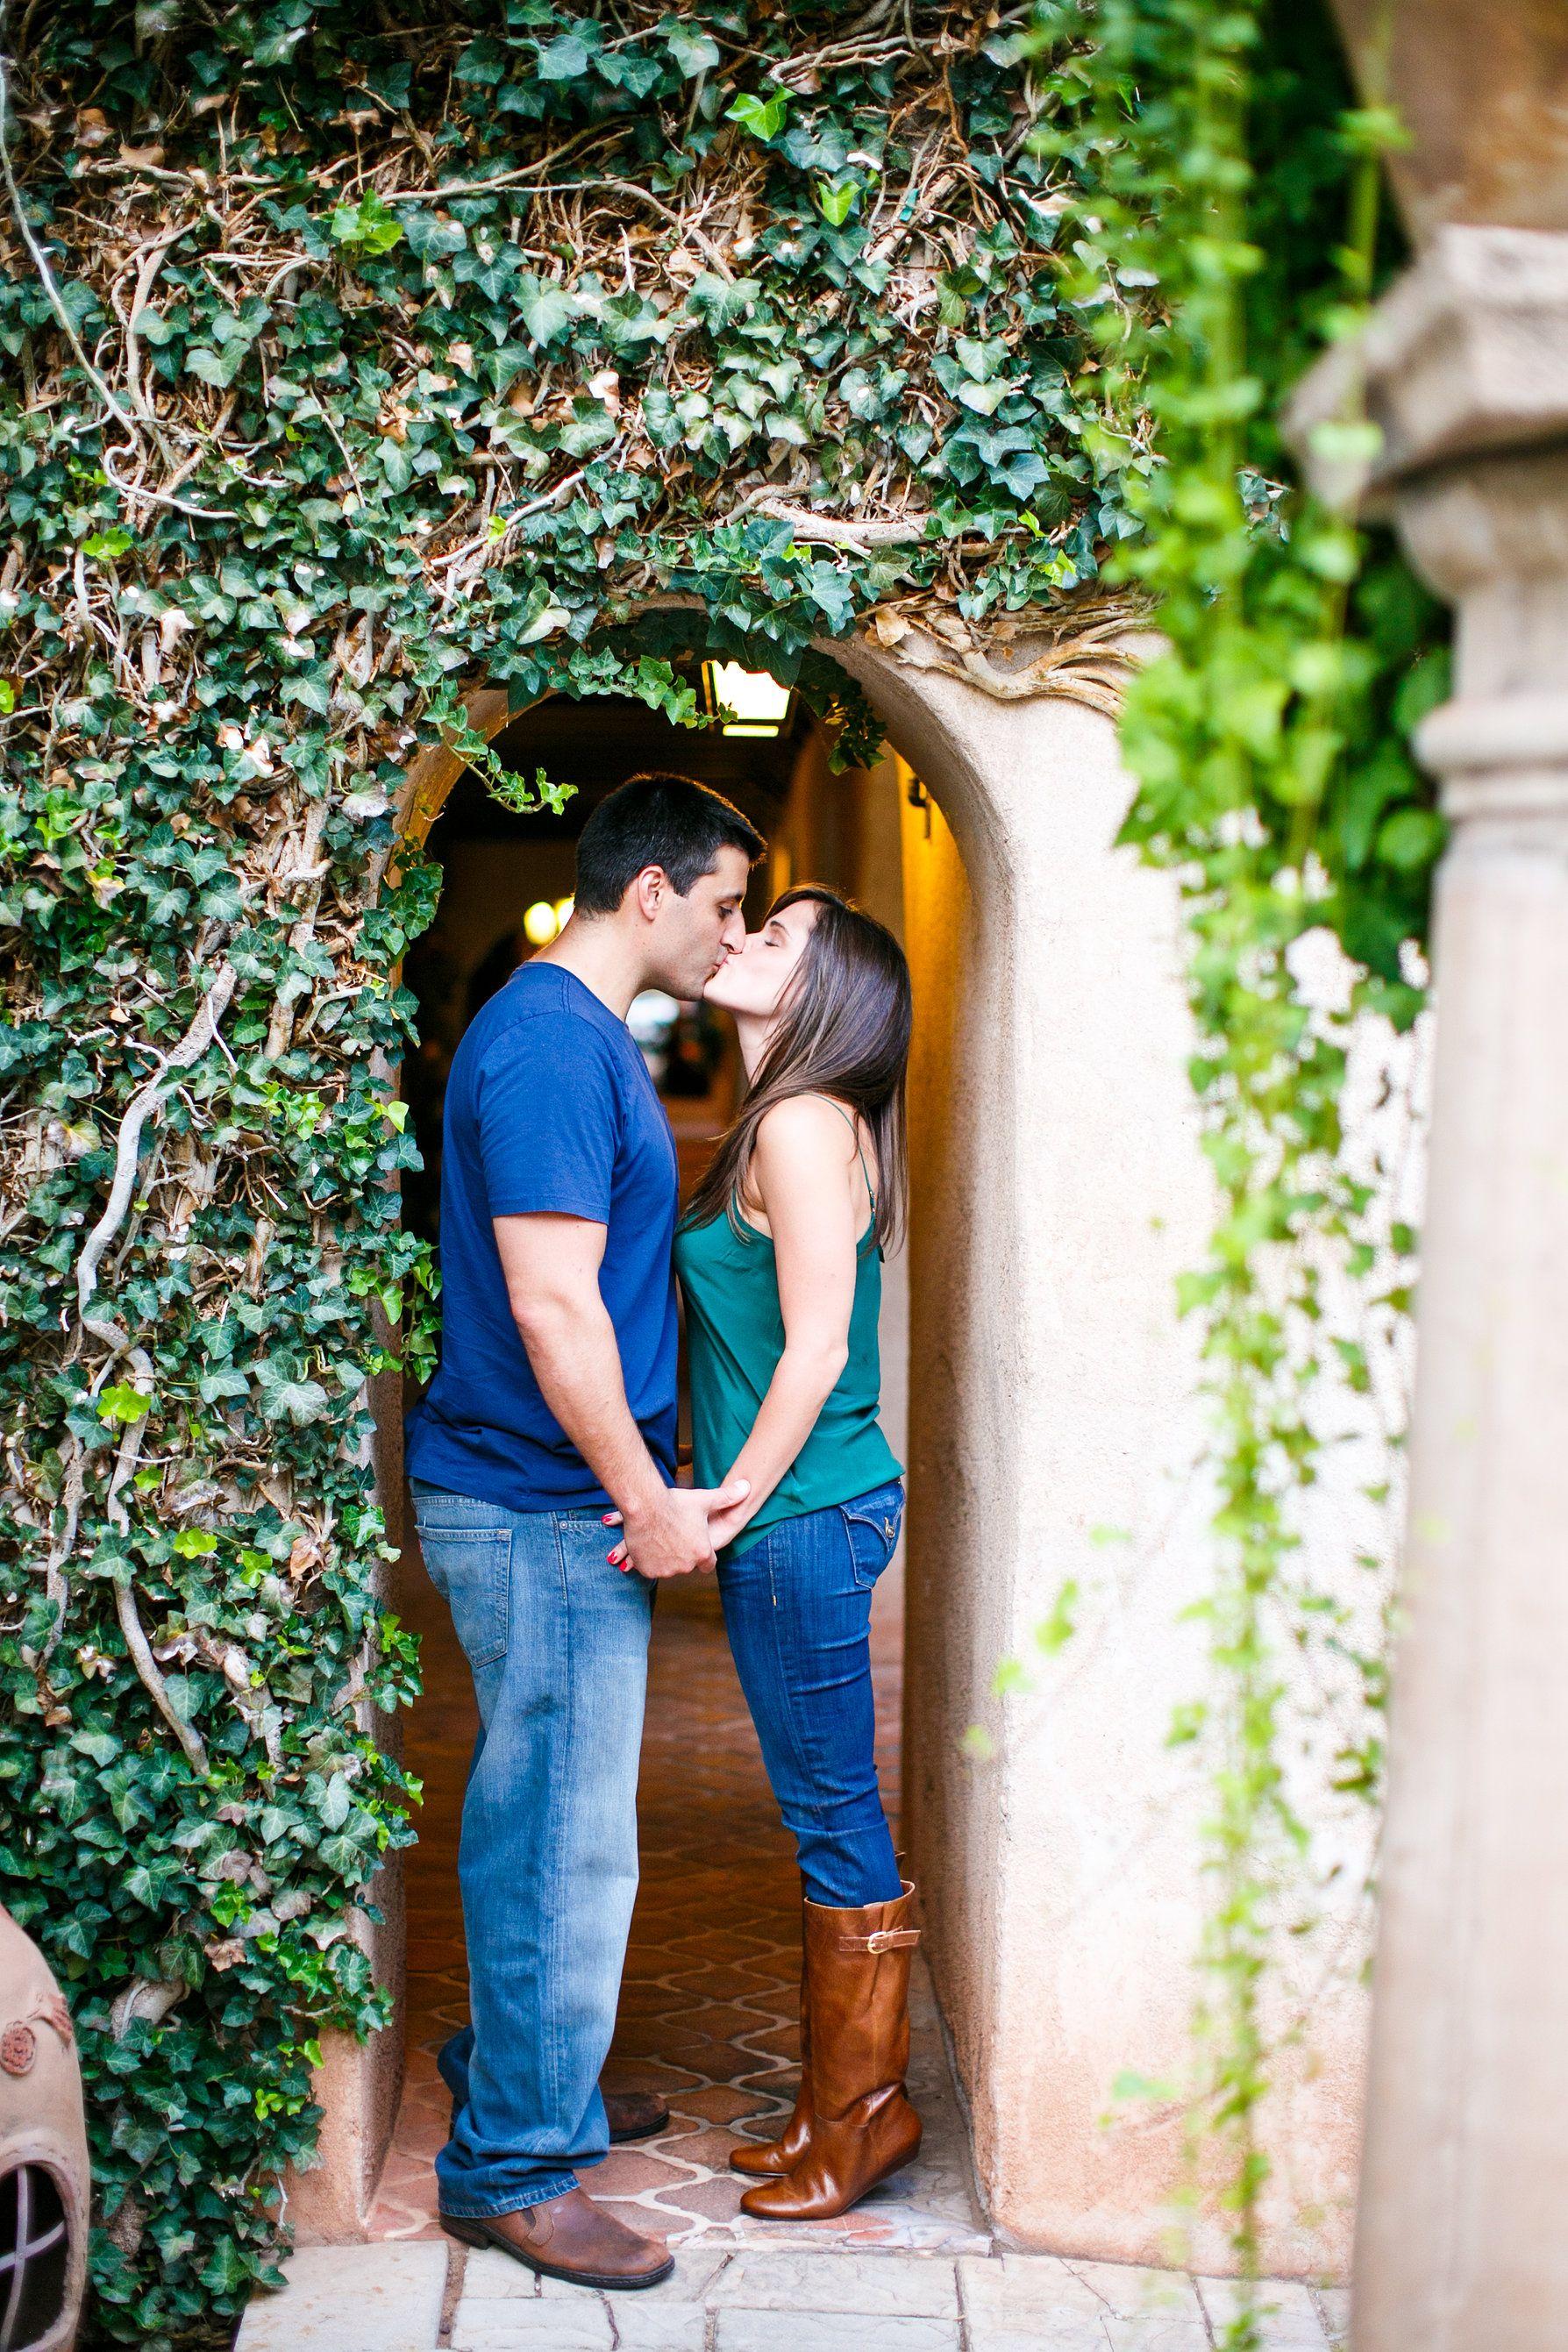 Engagement session in Sedona Arizona, by destination